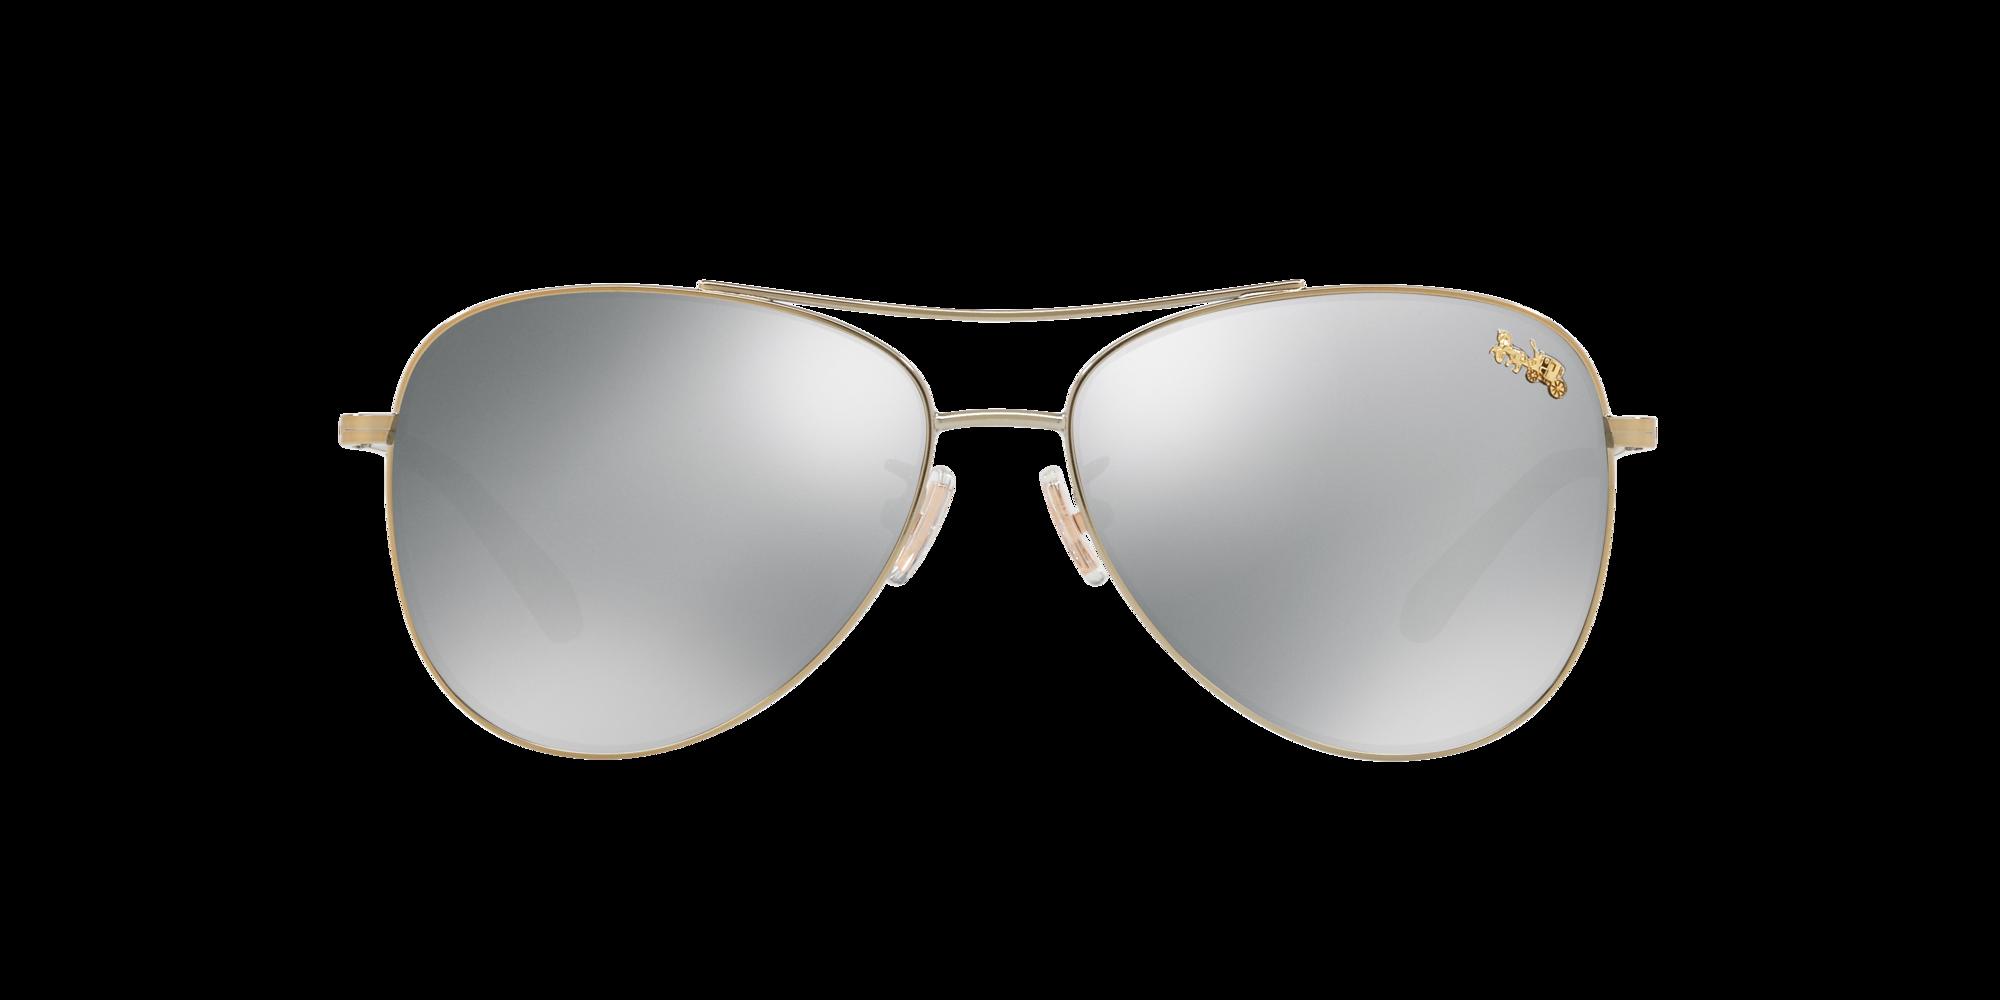 Image for HC7079 58 L1013 from LensCrafters | Glasses, Prescription Glasses Online, Eyewear